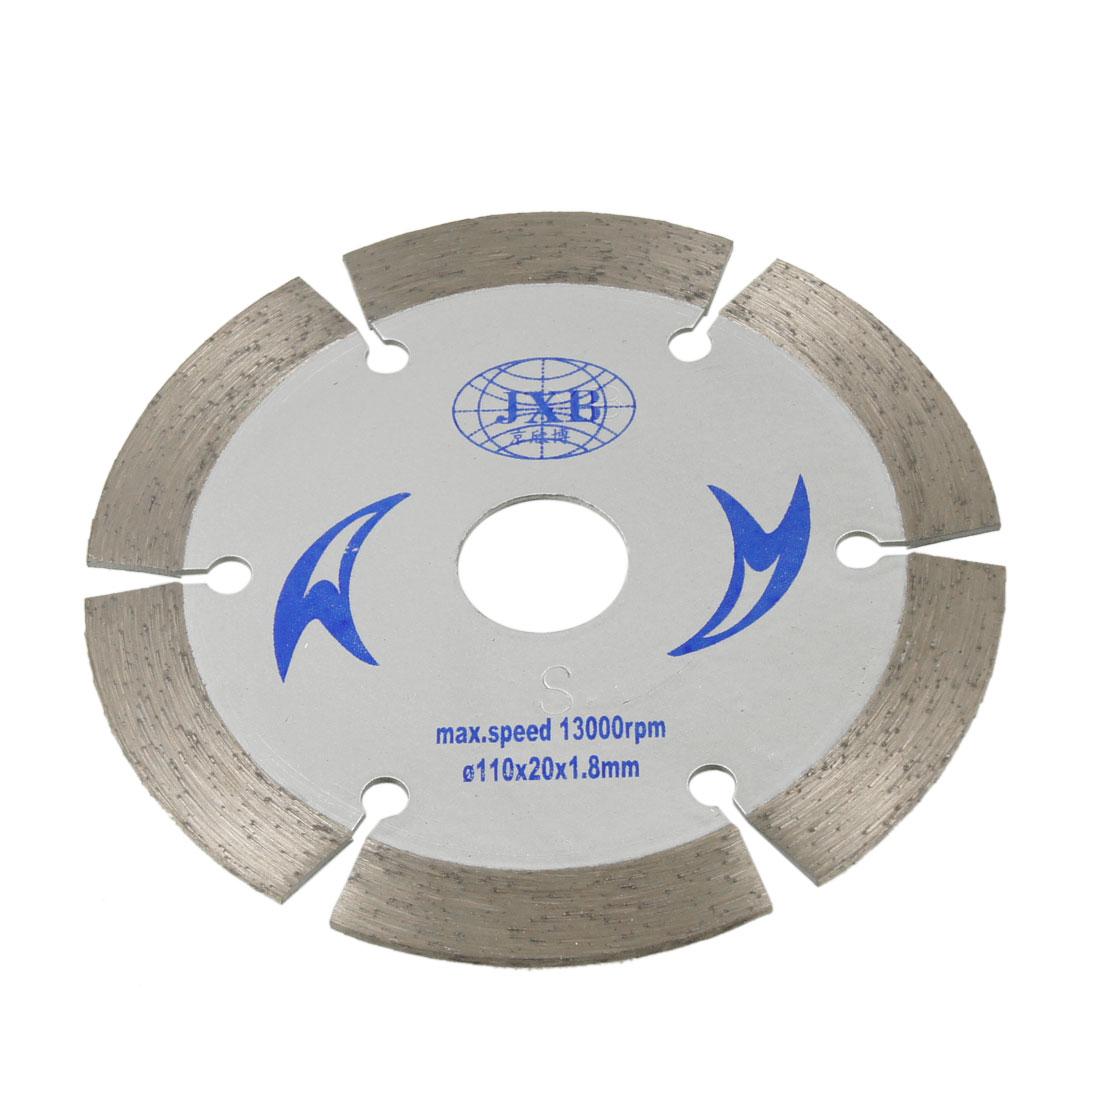 110mm Dia 6 Segments Diamond Circular Crack Saw Cutter